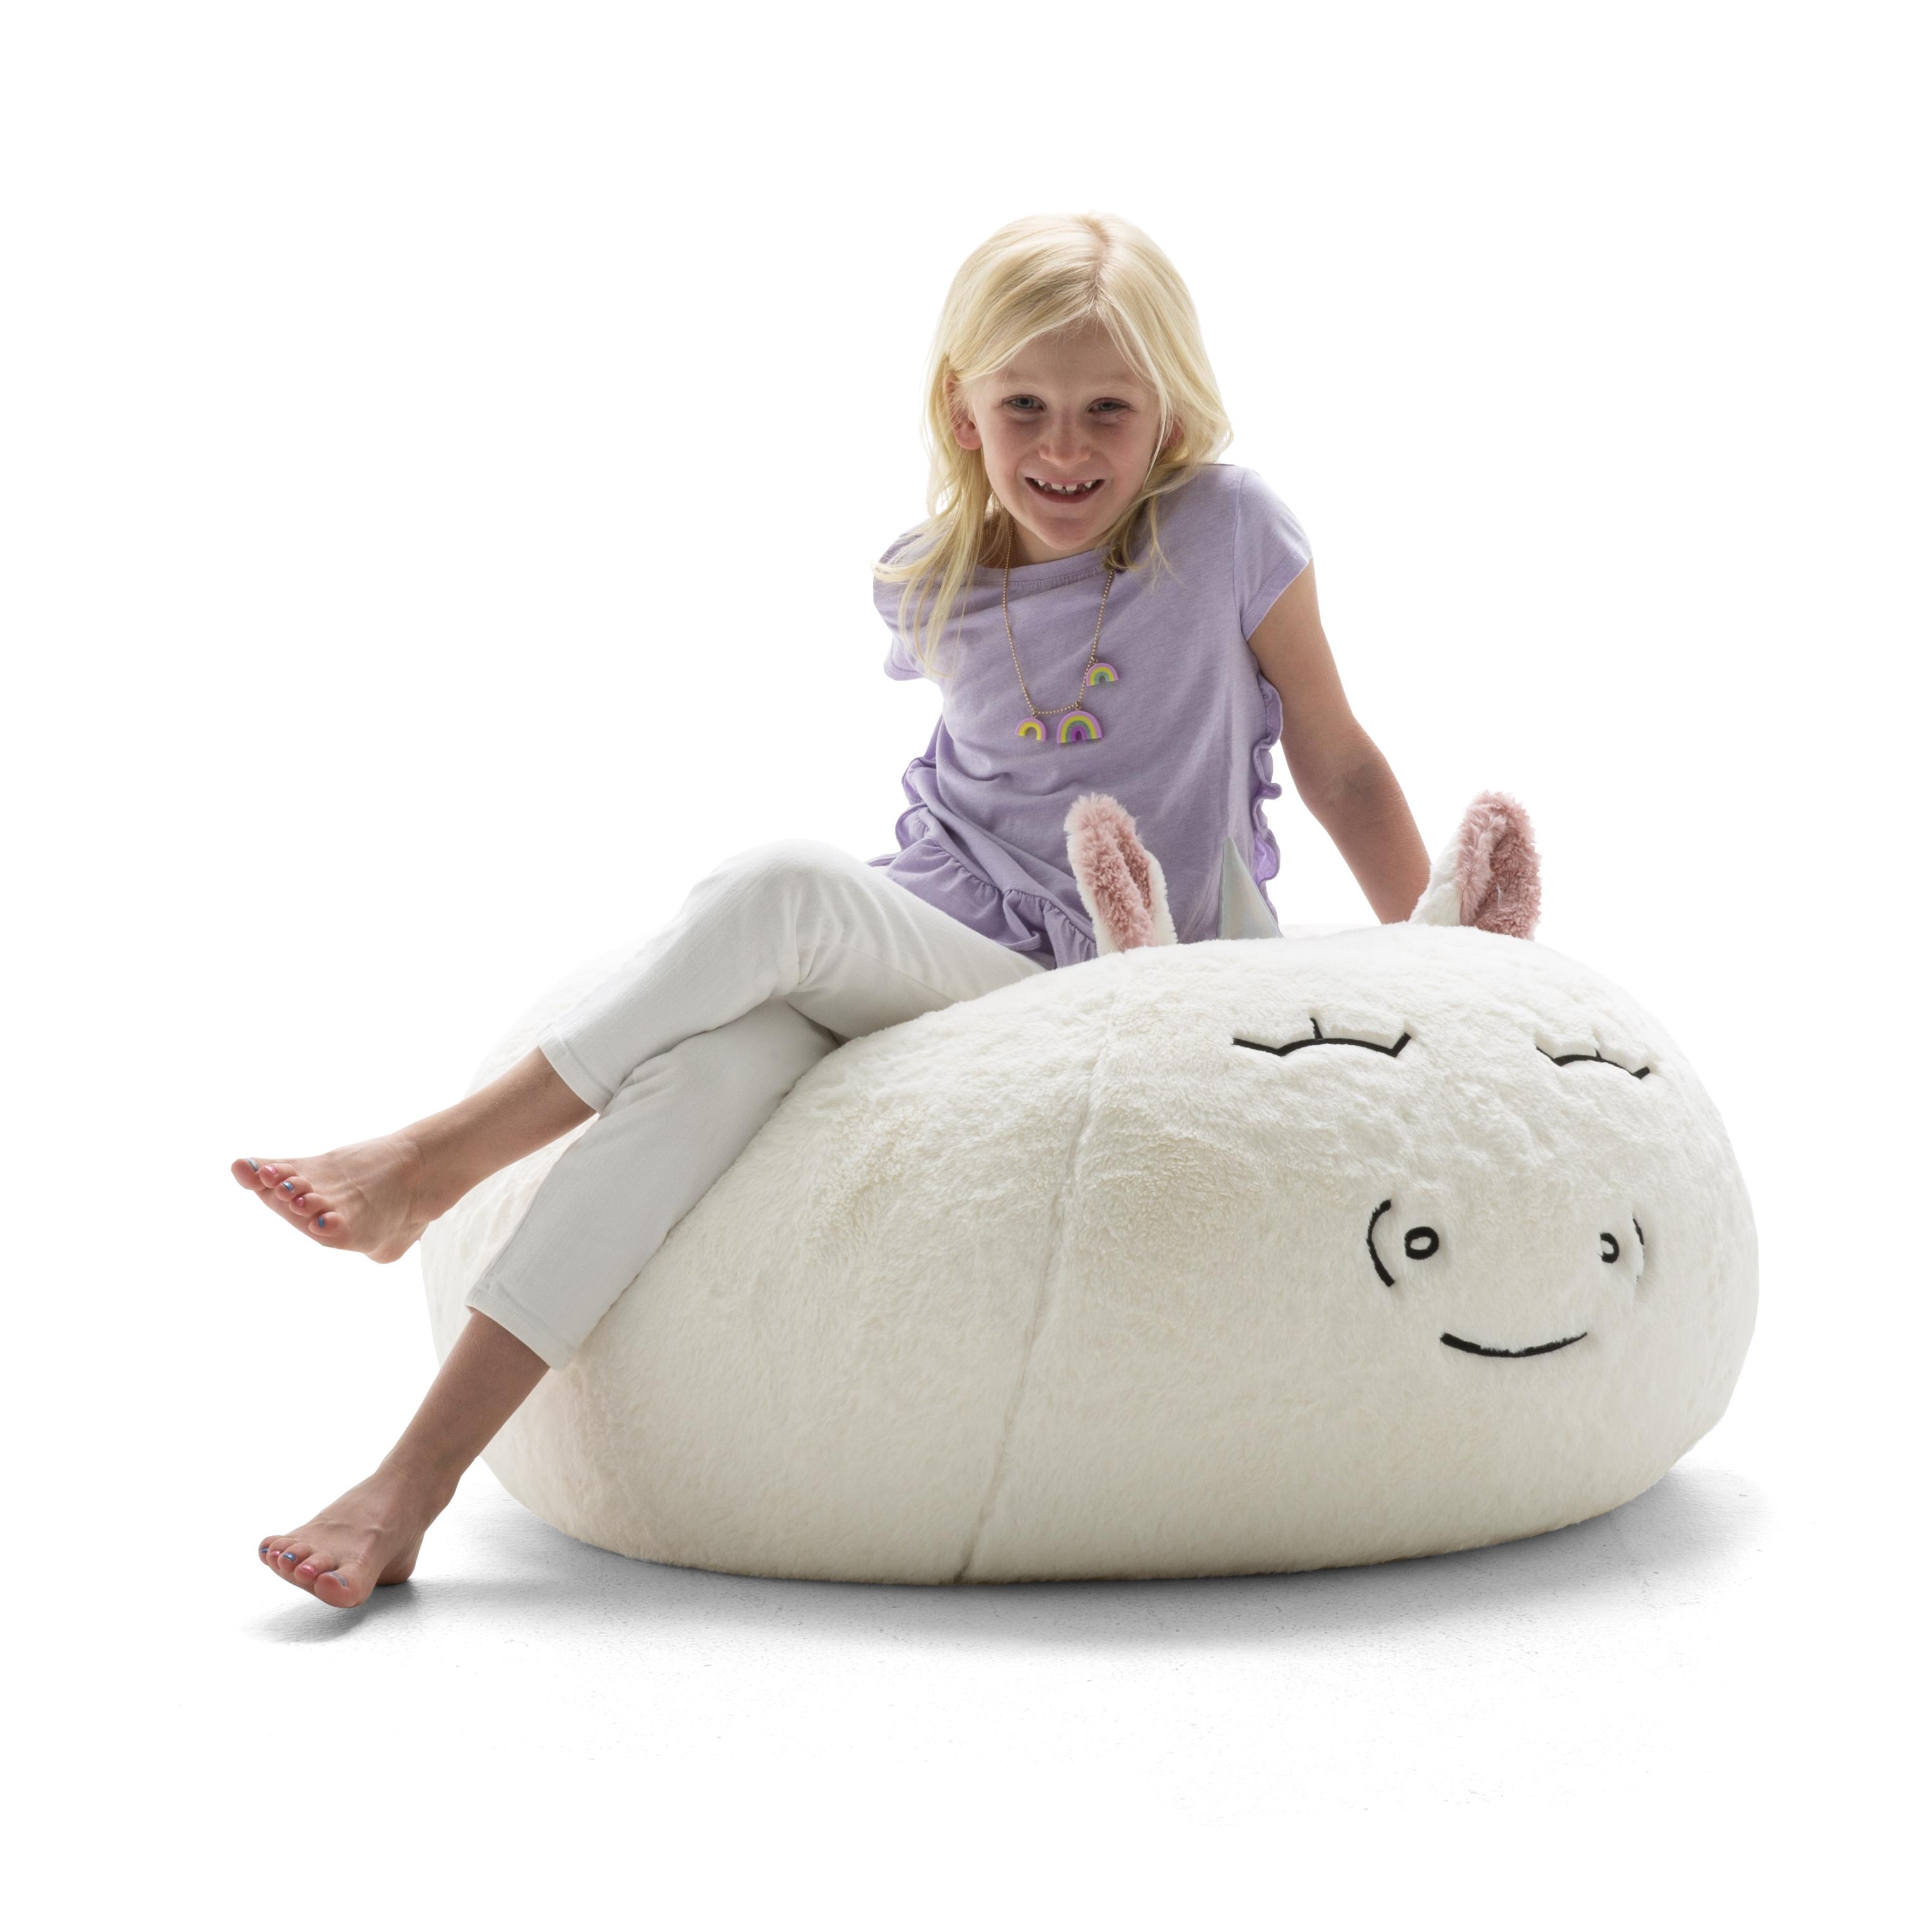 Big Joe Wild Bunch Animal Bean Bag Chair, Multiple Options